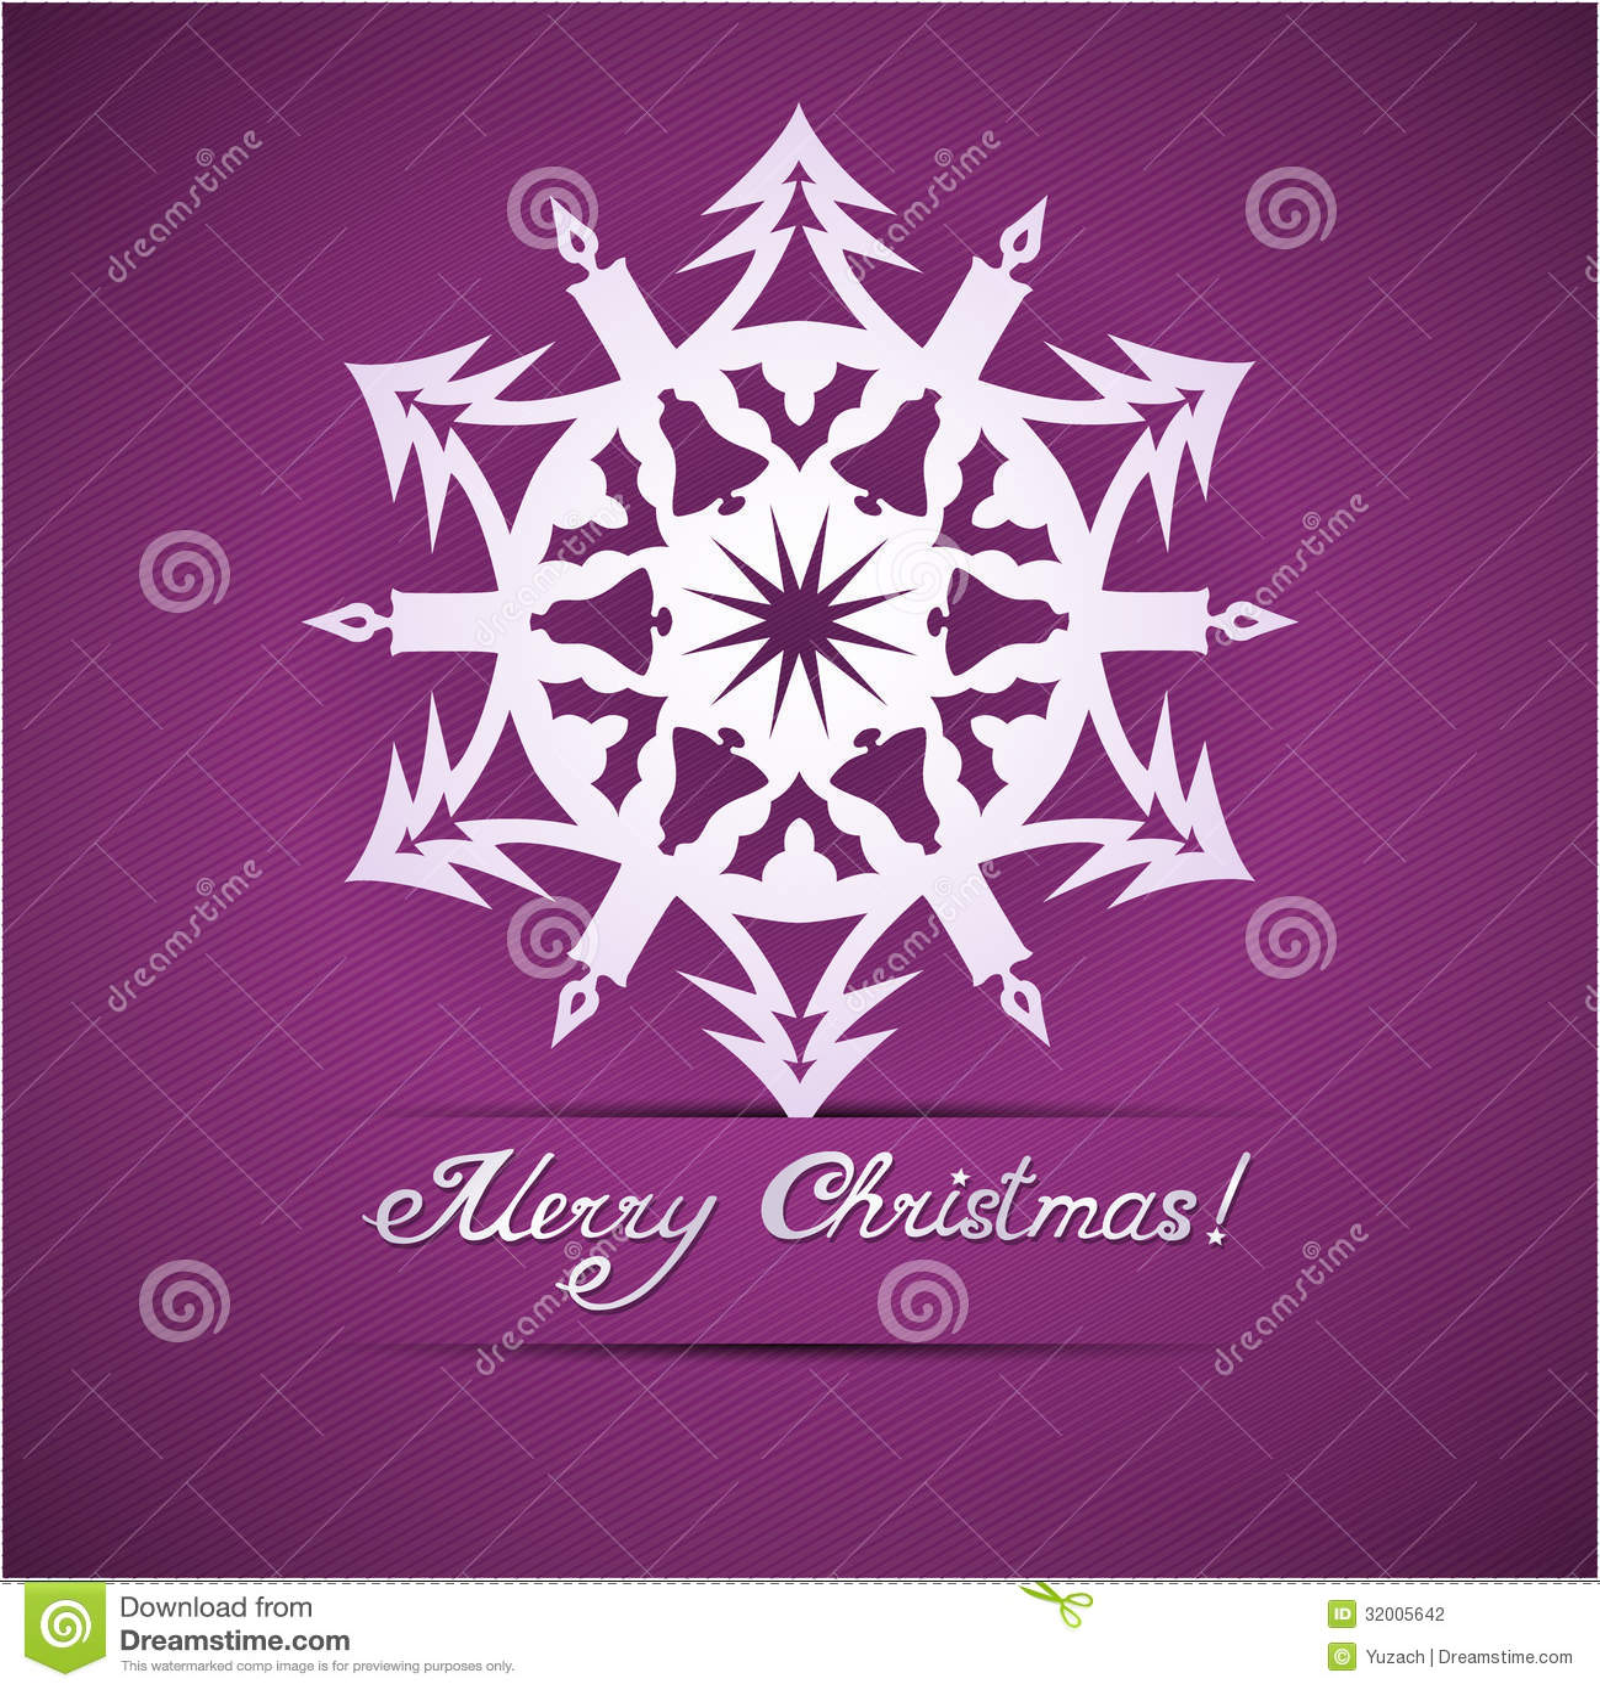 Paper Origami Christmas Card Stock Illustration - Illustration of ...